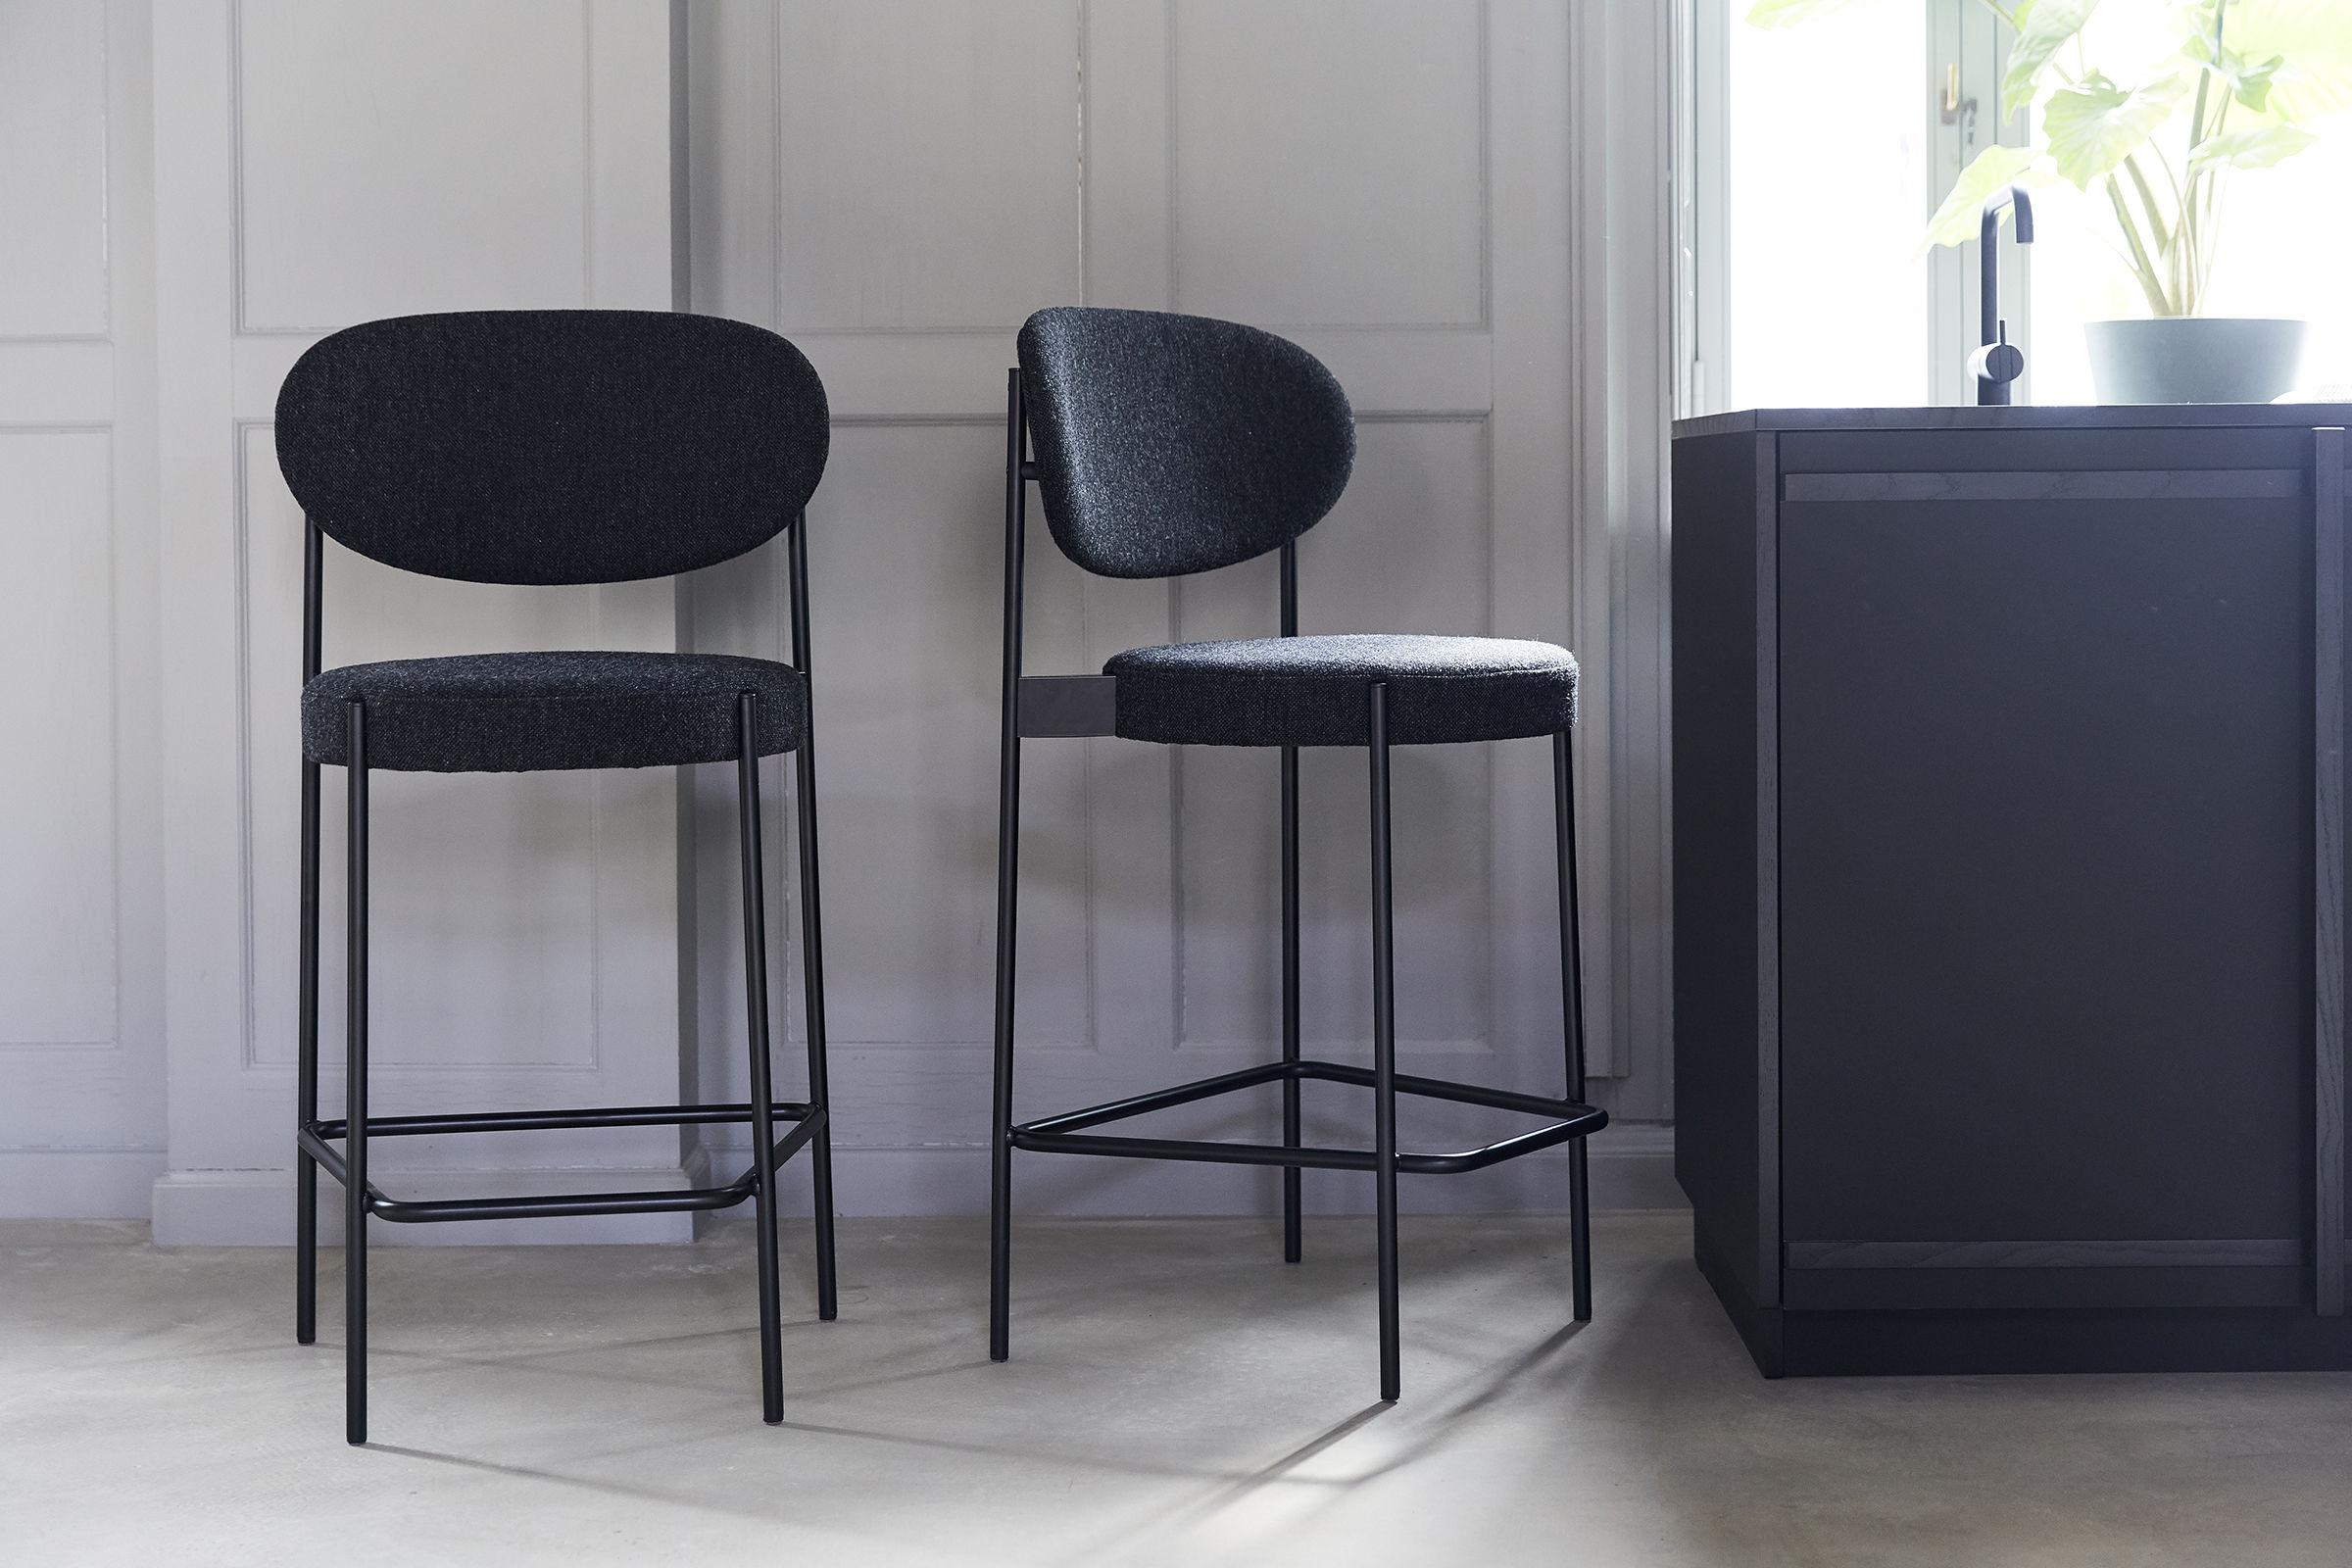 Sgabello bar series 430 verpan tessuto grigio scuro l 54 x h